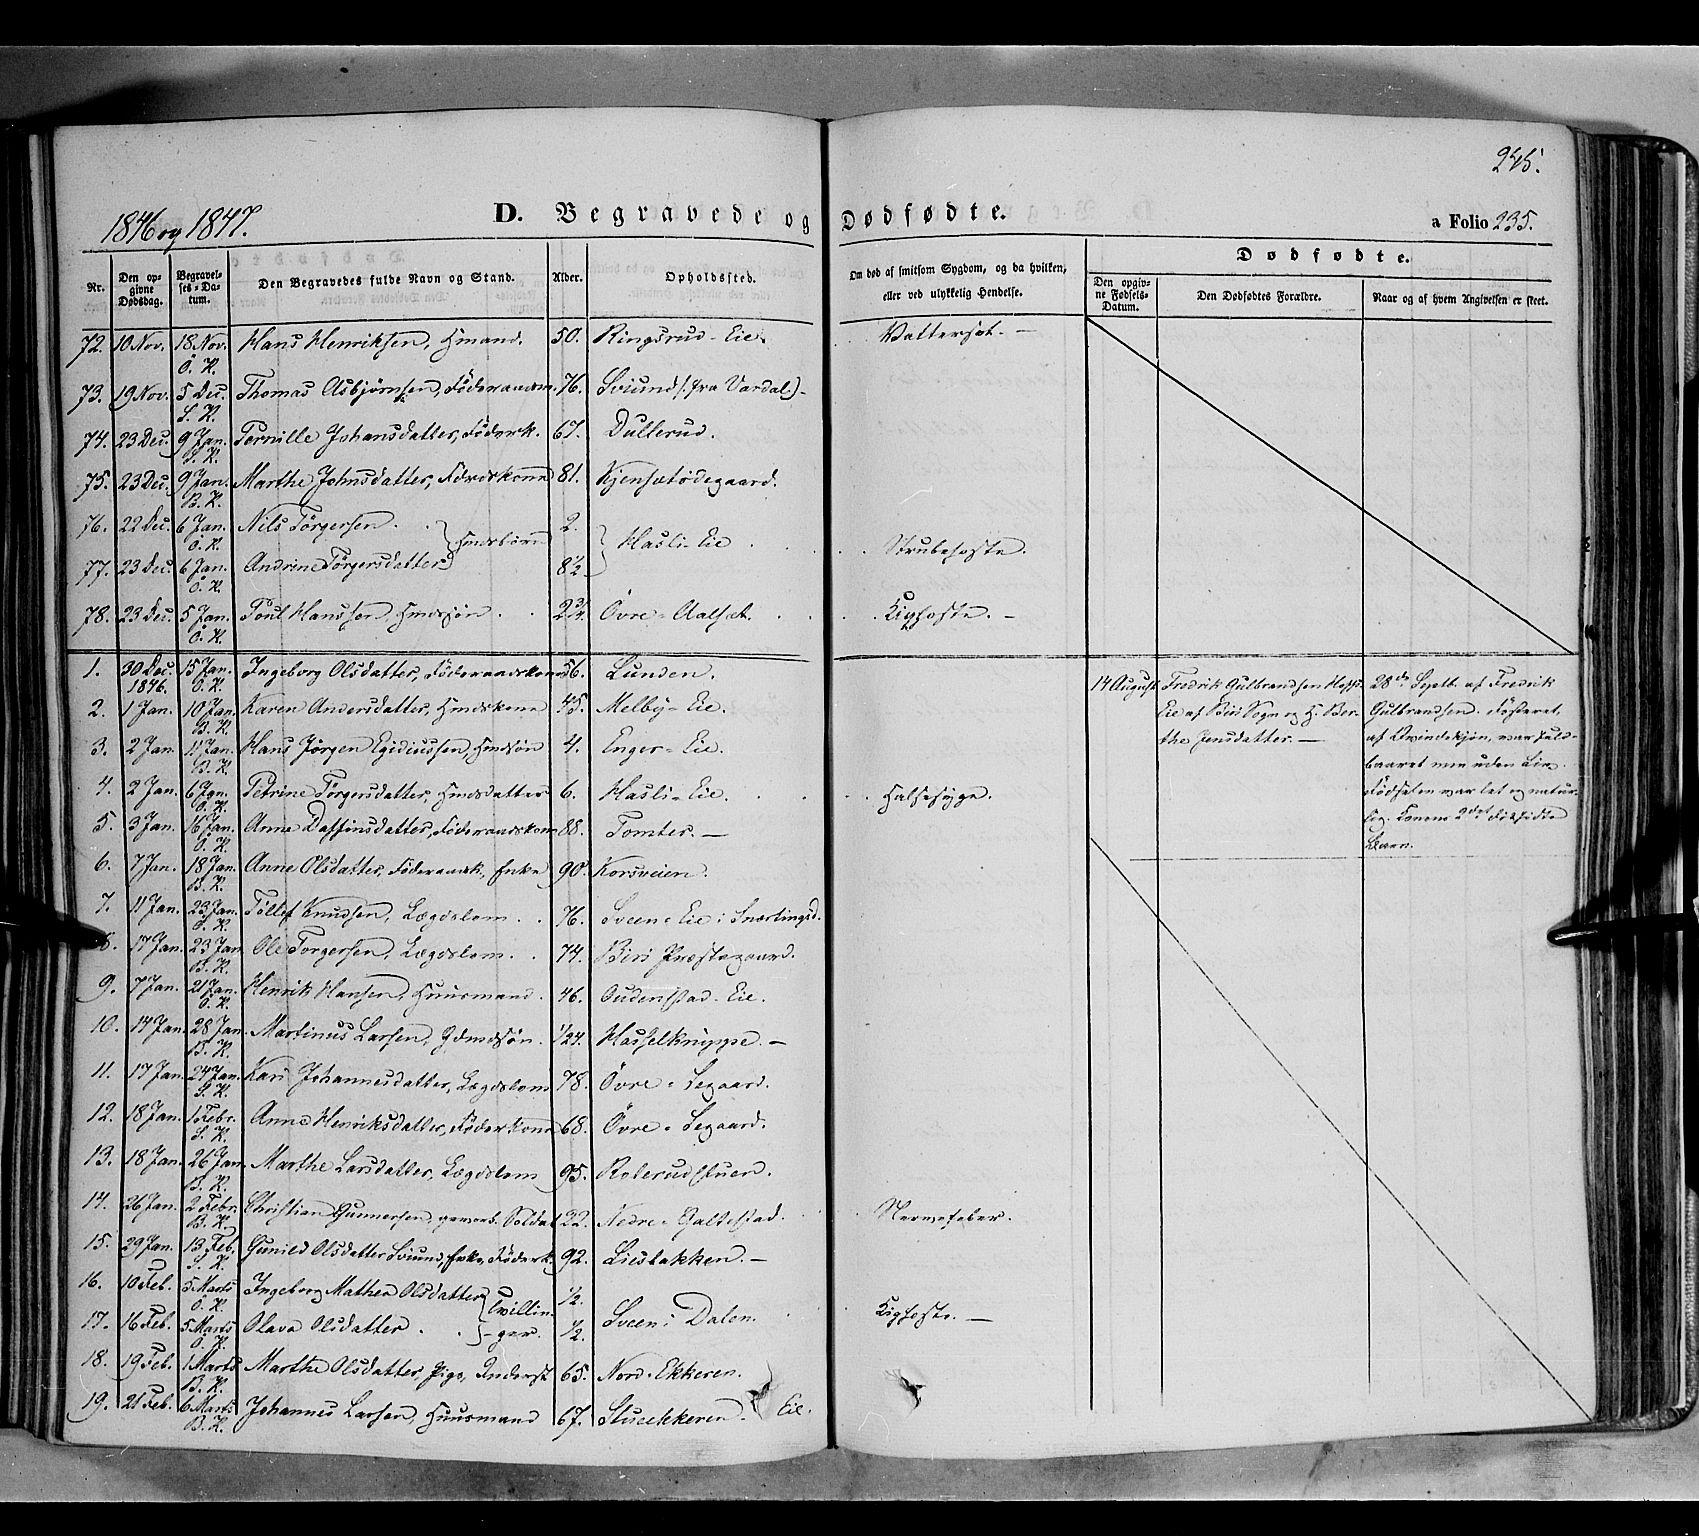 SAH, Biri prestekontor, Ministerialbok nr. 5, 1843-1854, s. 245